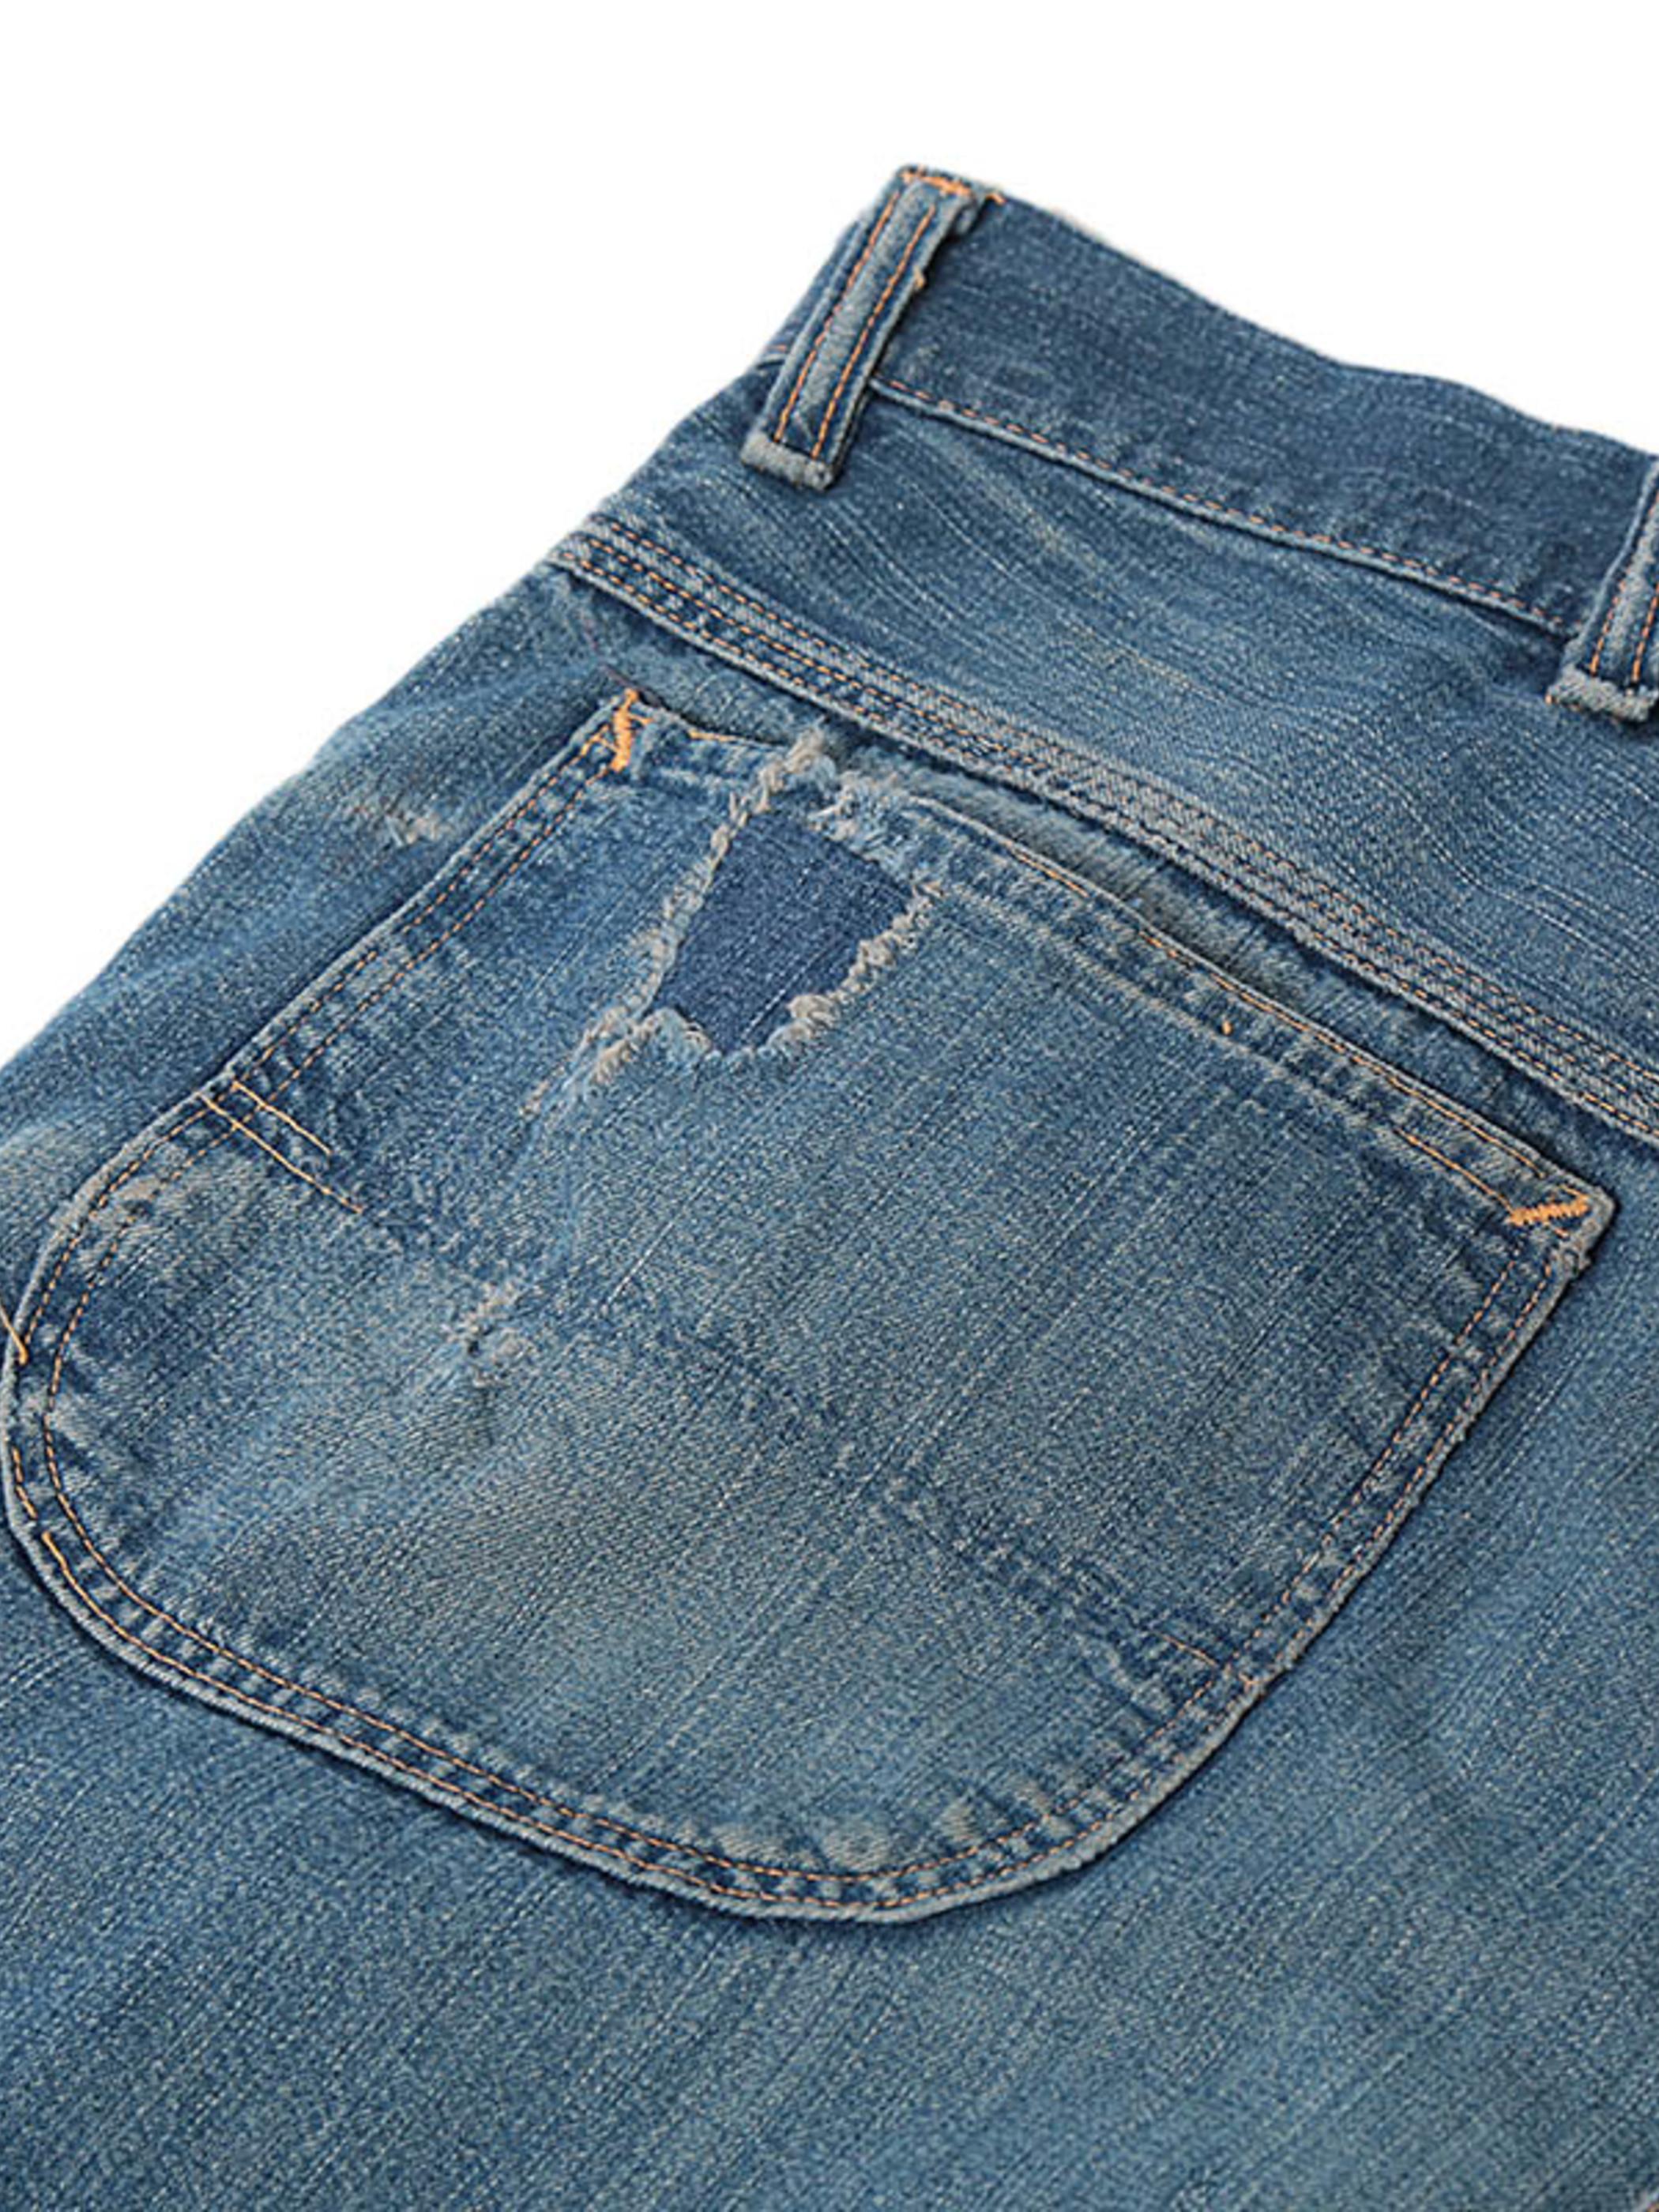 Used / Sears / 1960's Vintage / Painter Denim Pants / 35inch